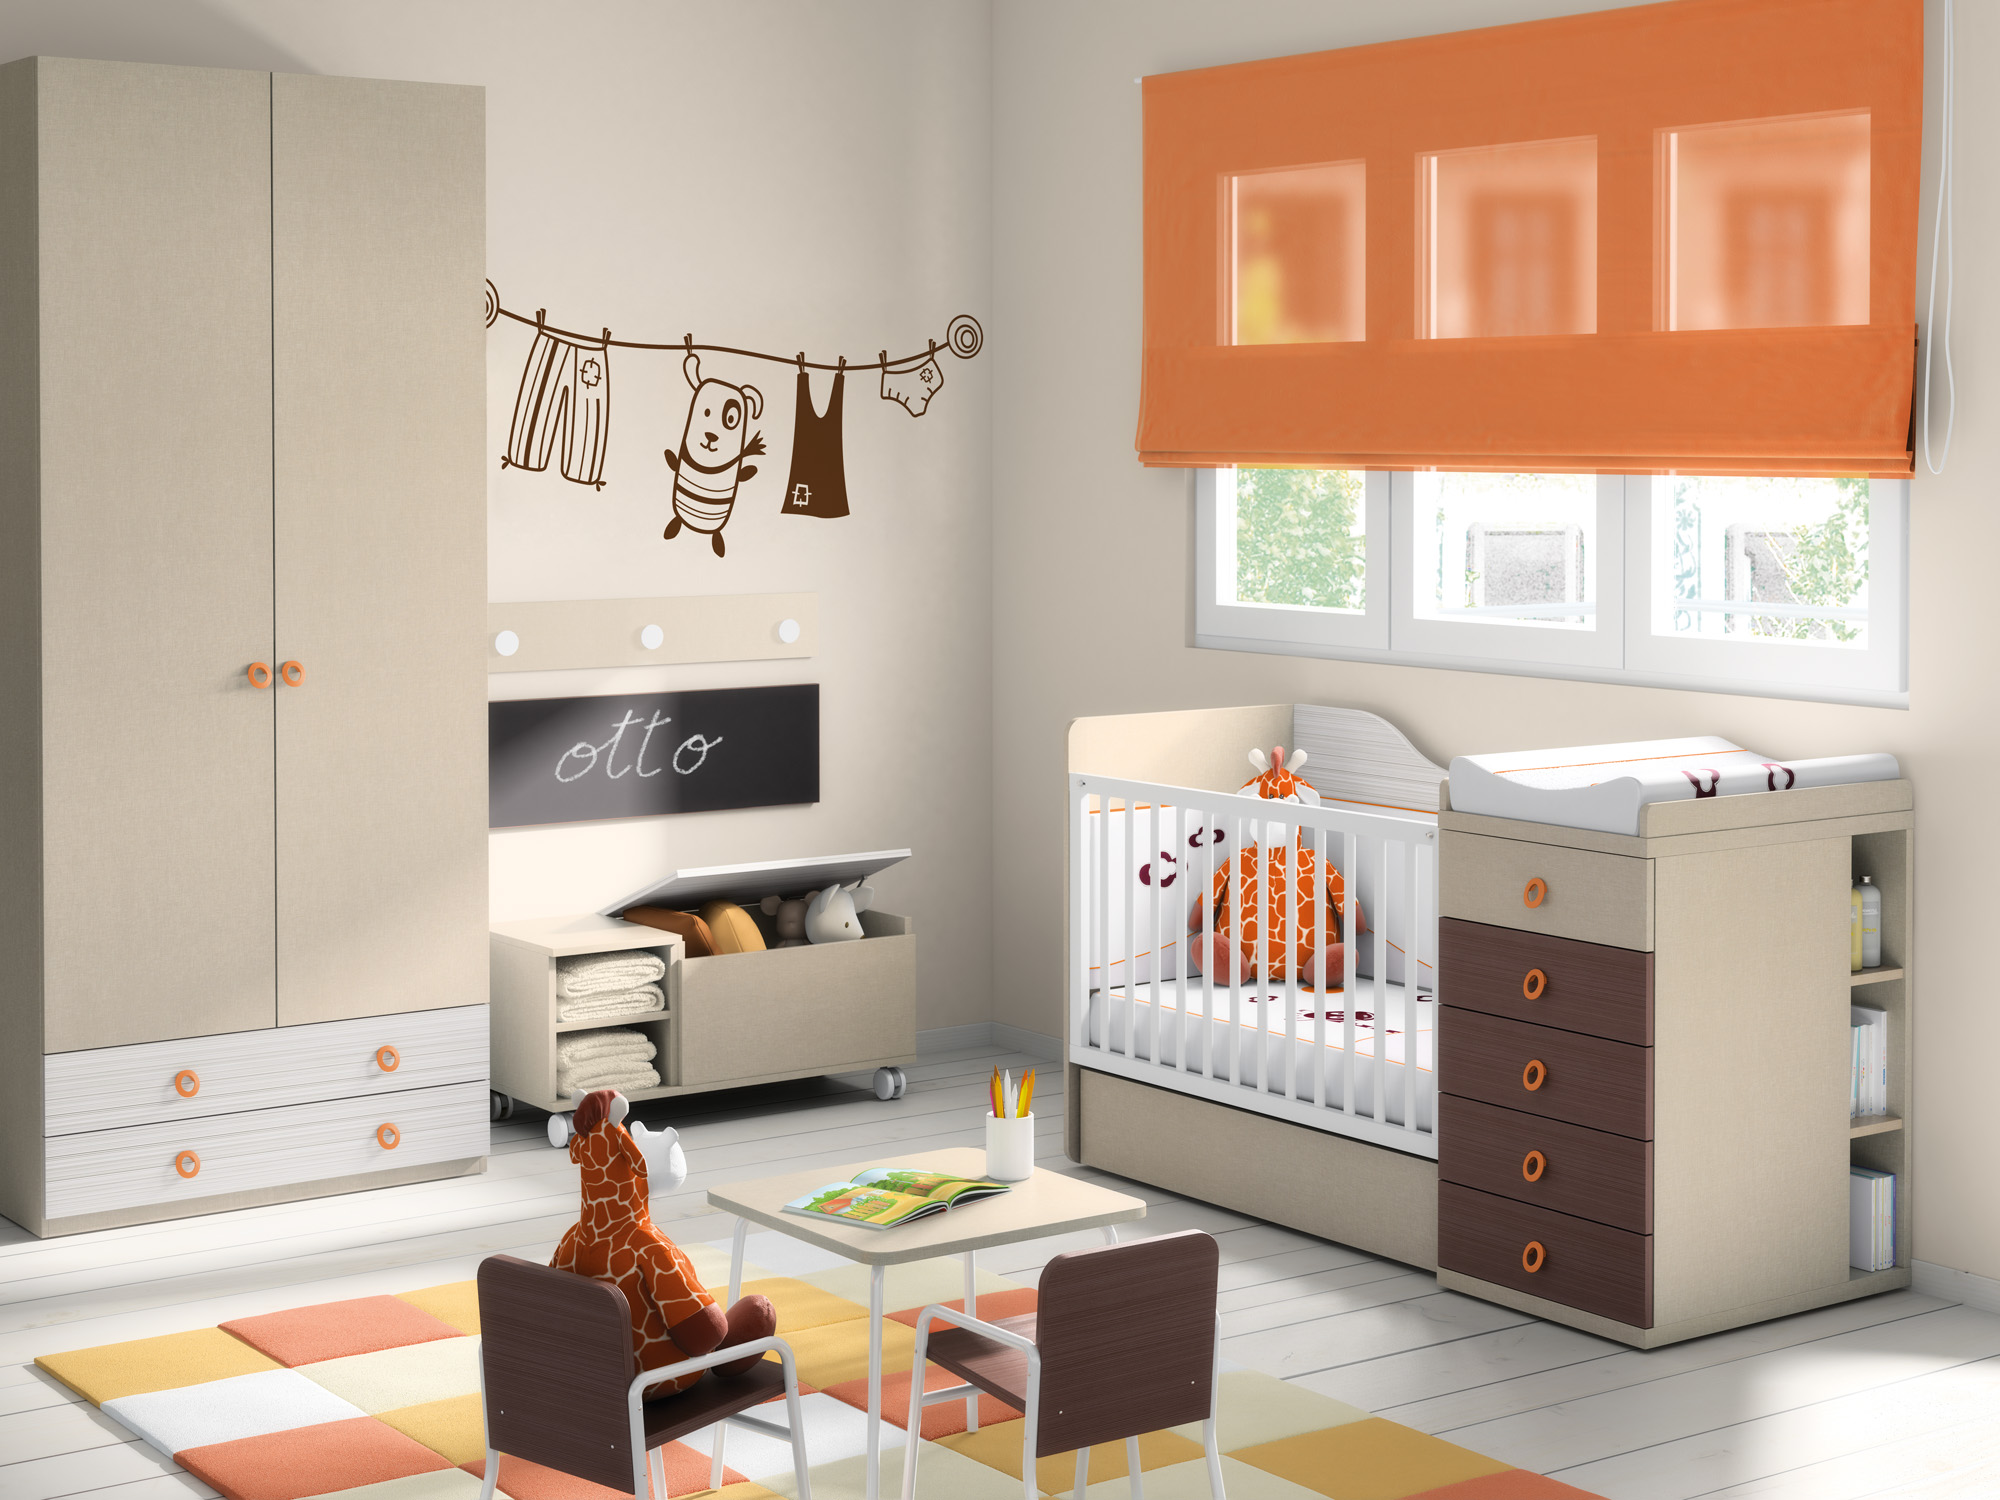 Mueble infantil de calidad en Teruel